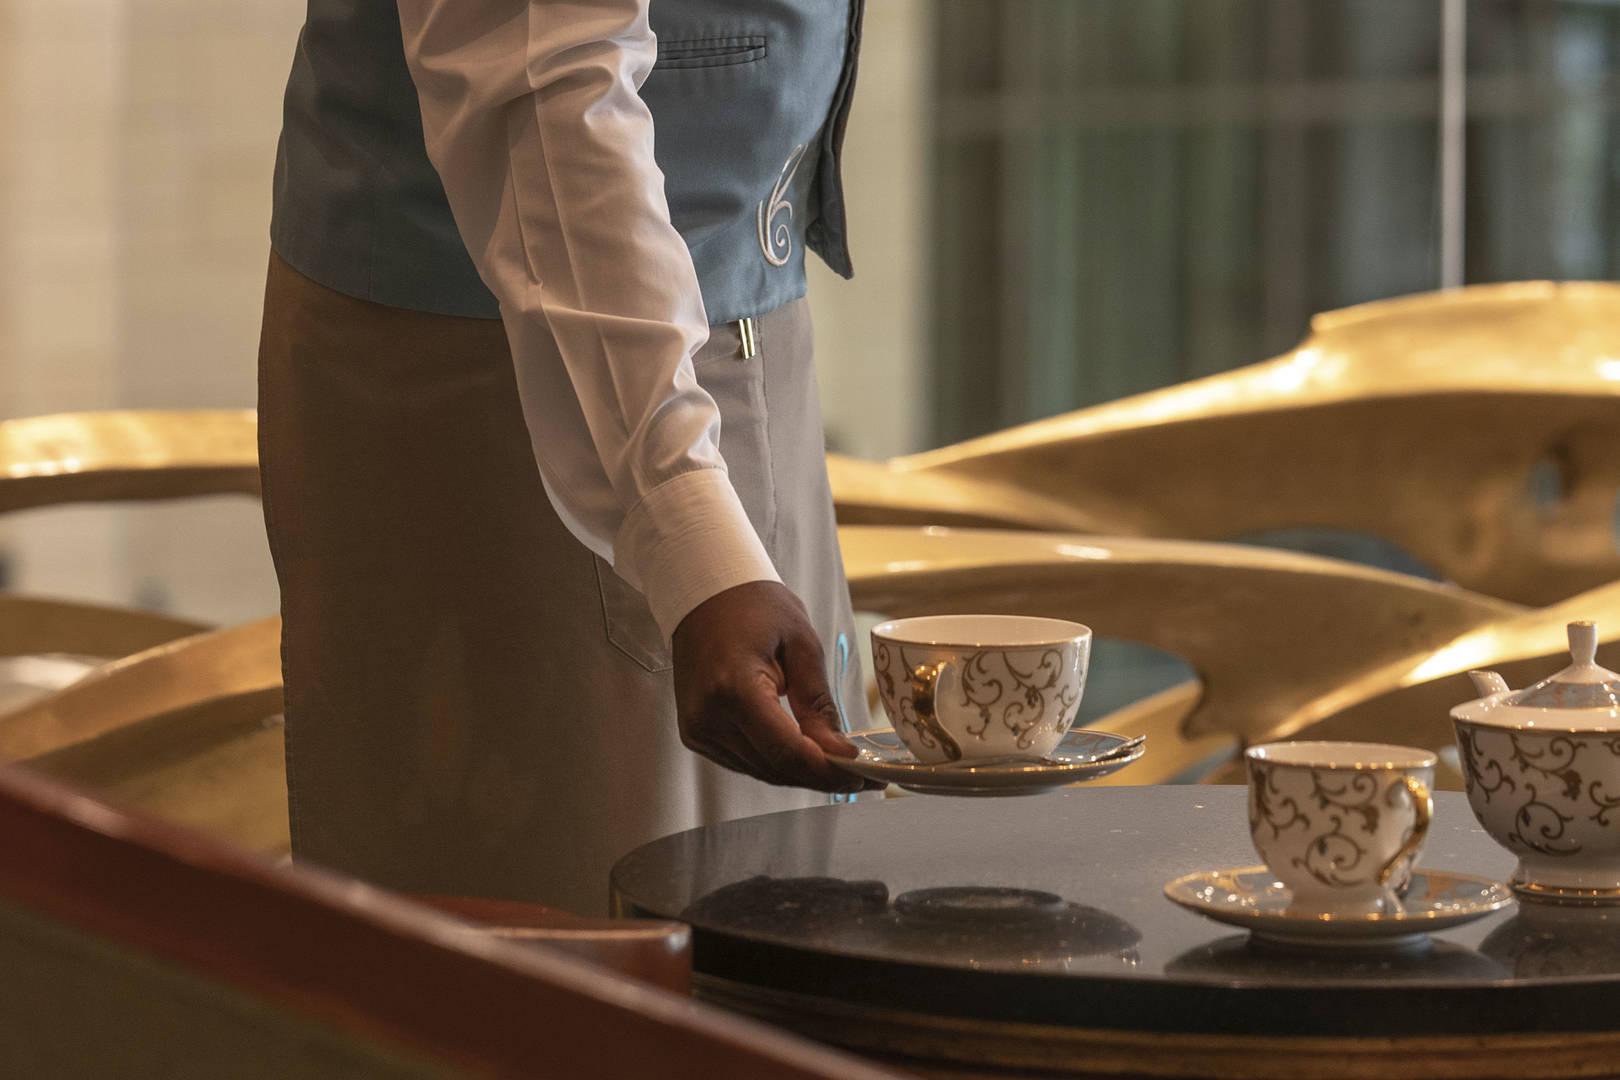 https://cdn.jumeirah.com/-/mediadh/DH/Hospitality/Jumeirah/Restaurants/Kuwait/Messilah-Tea-Lounge/Restaurant-Gallery/Tea-Lounge_6-4.jpg?h=1080&w=1620&hash=68F746E7E98714717910B067124B9716